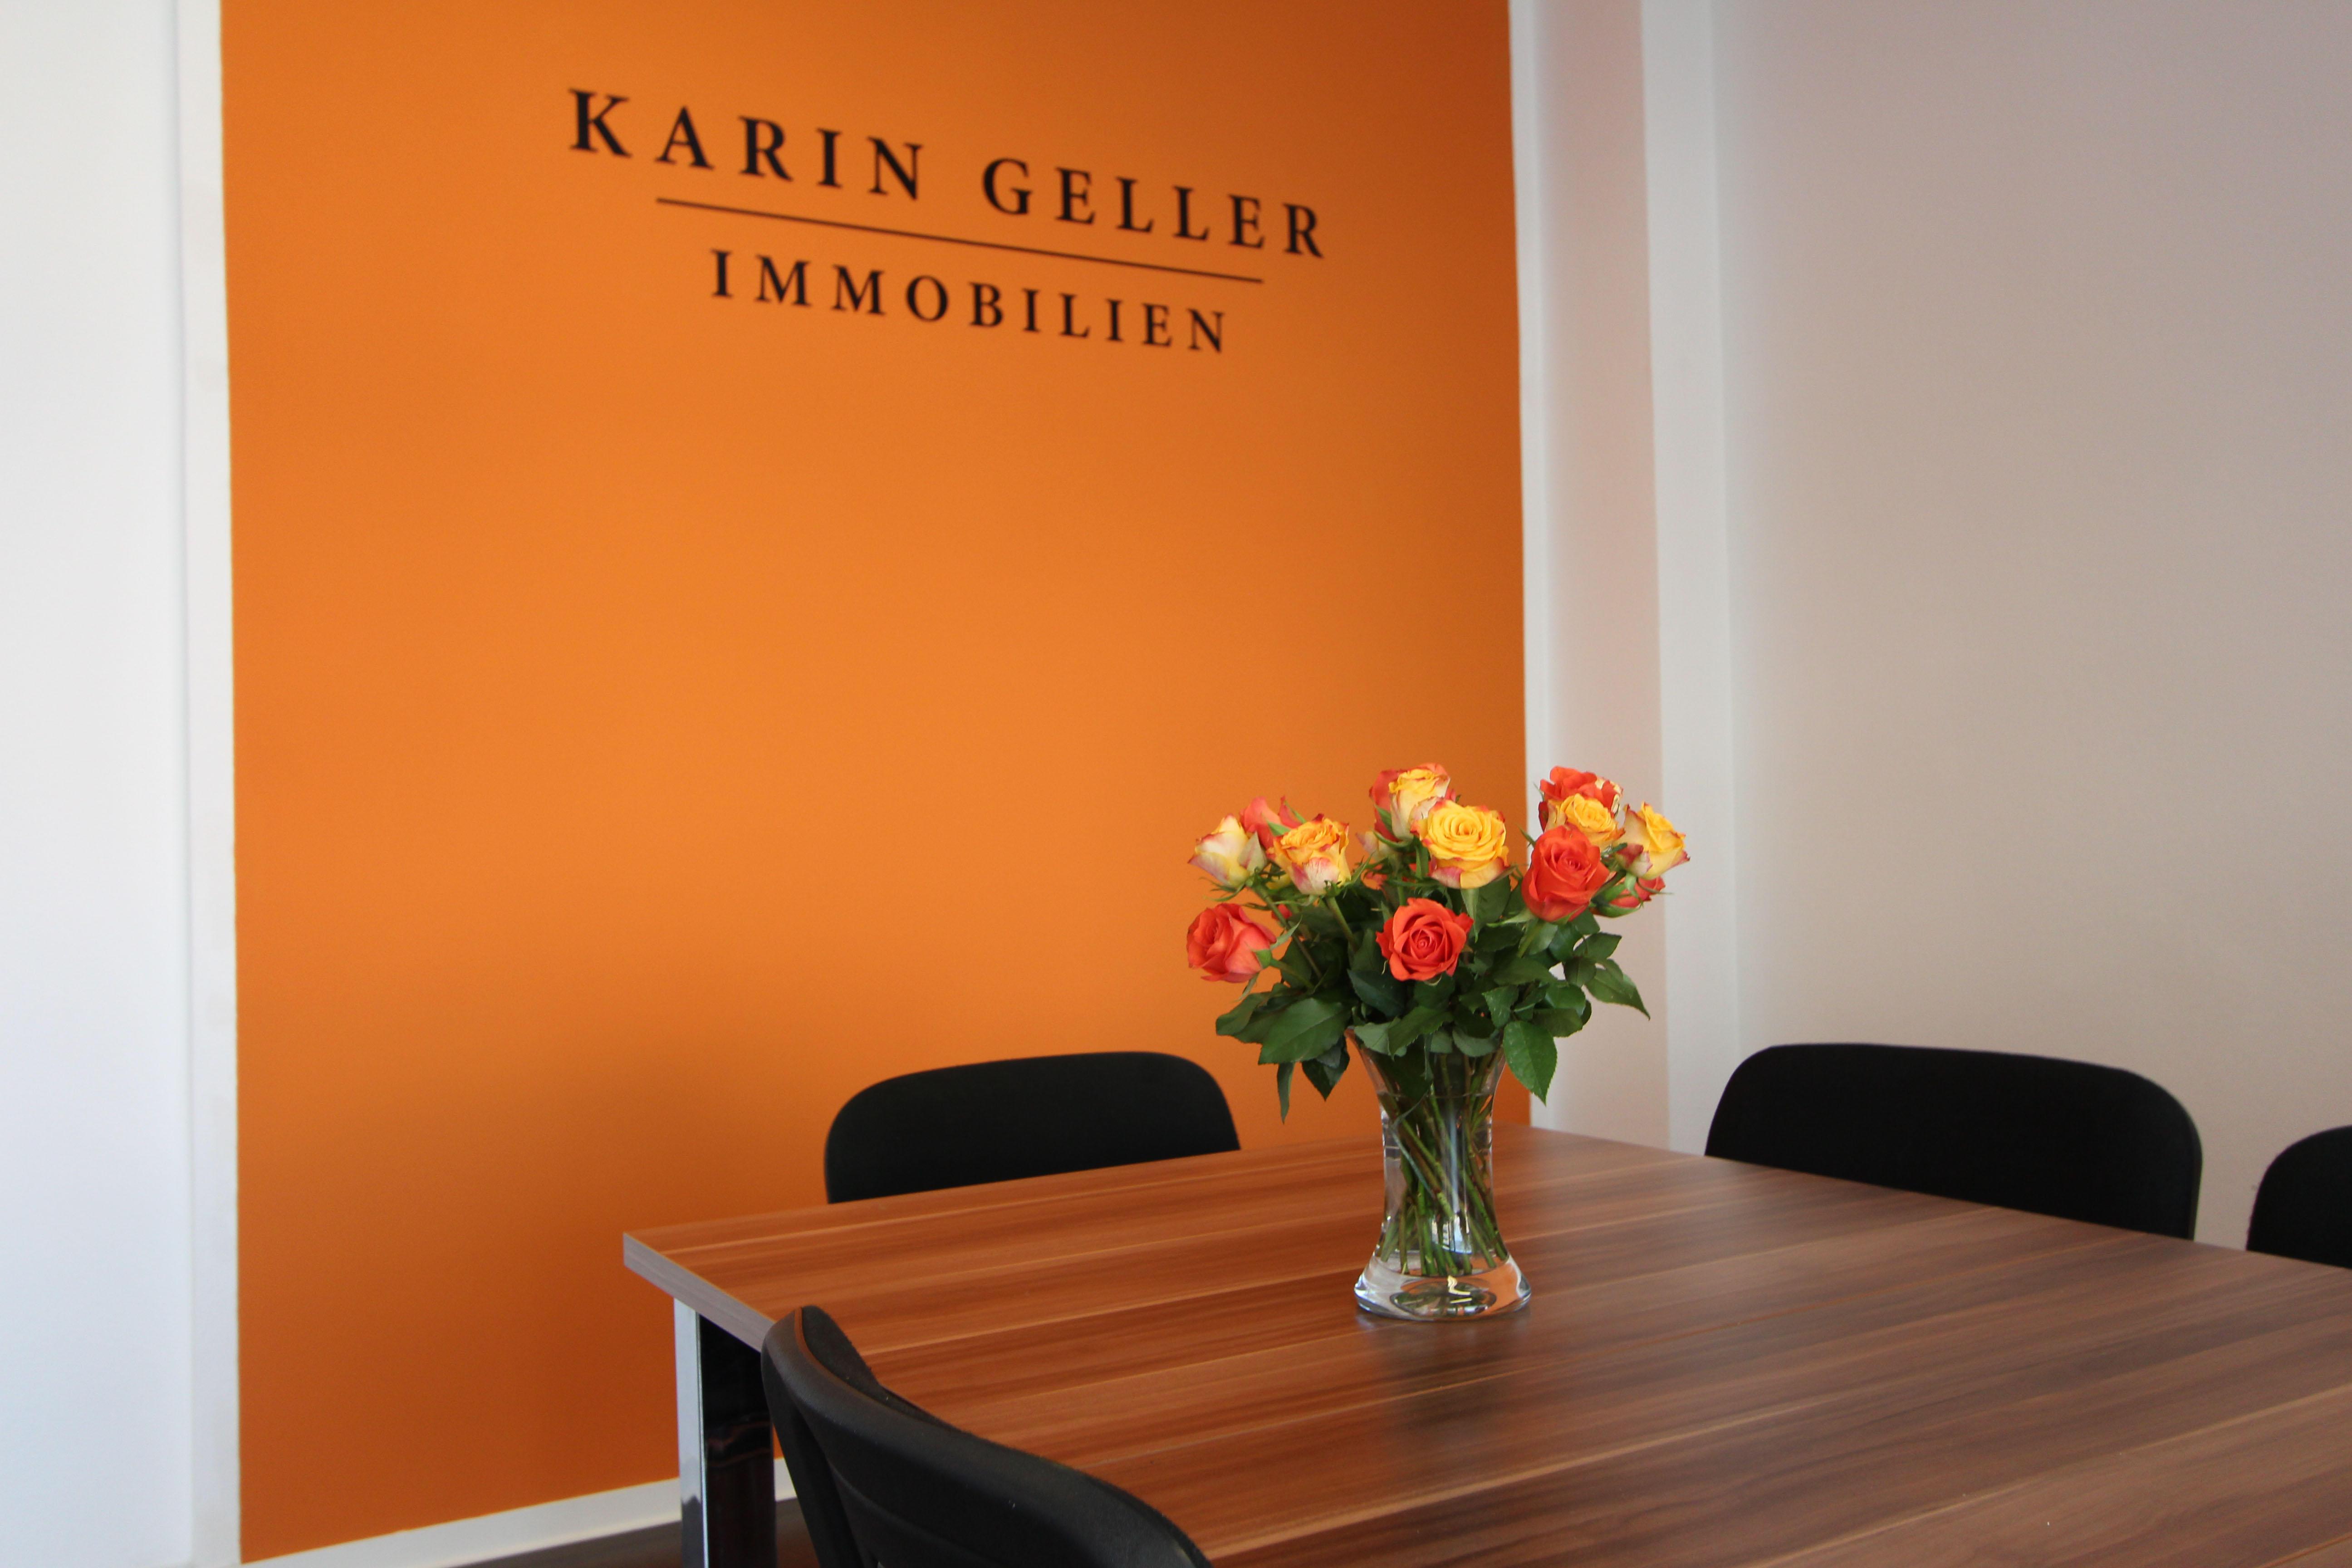 Karin Geller geprüfte Immobilienmaklerin / Hausverwalterin IVD Köln Köln